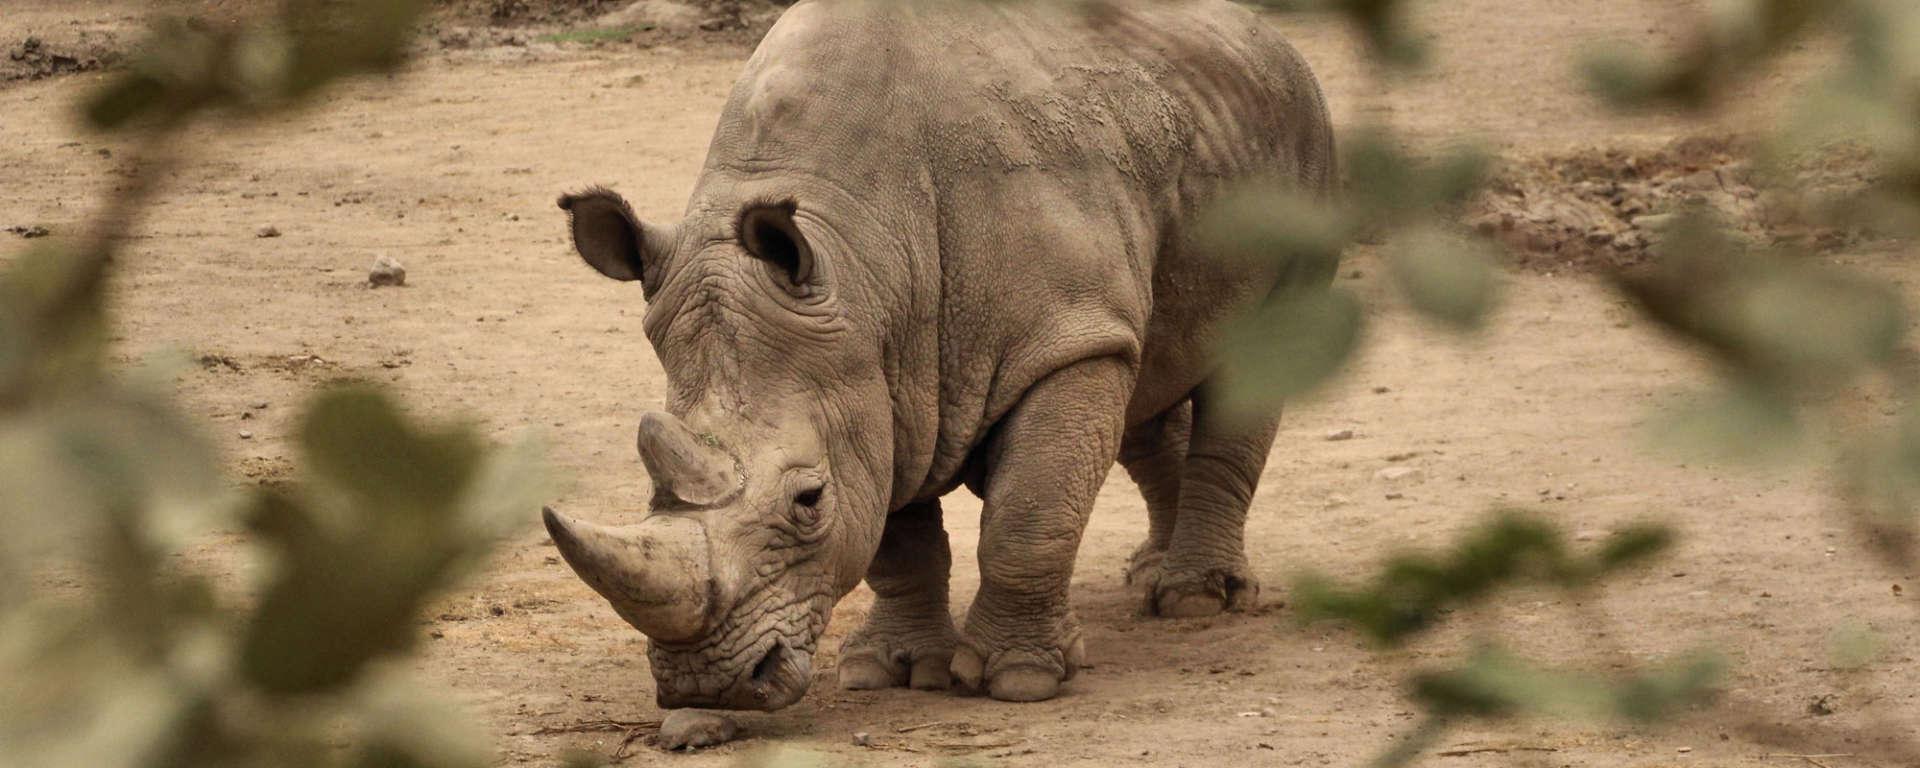 rhino by pat and david tollefson